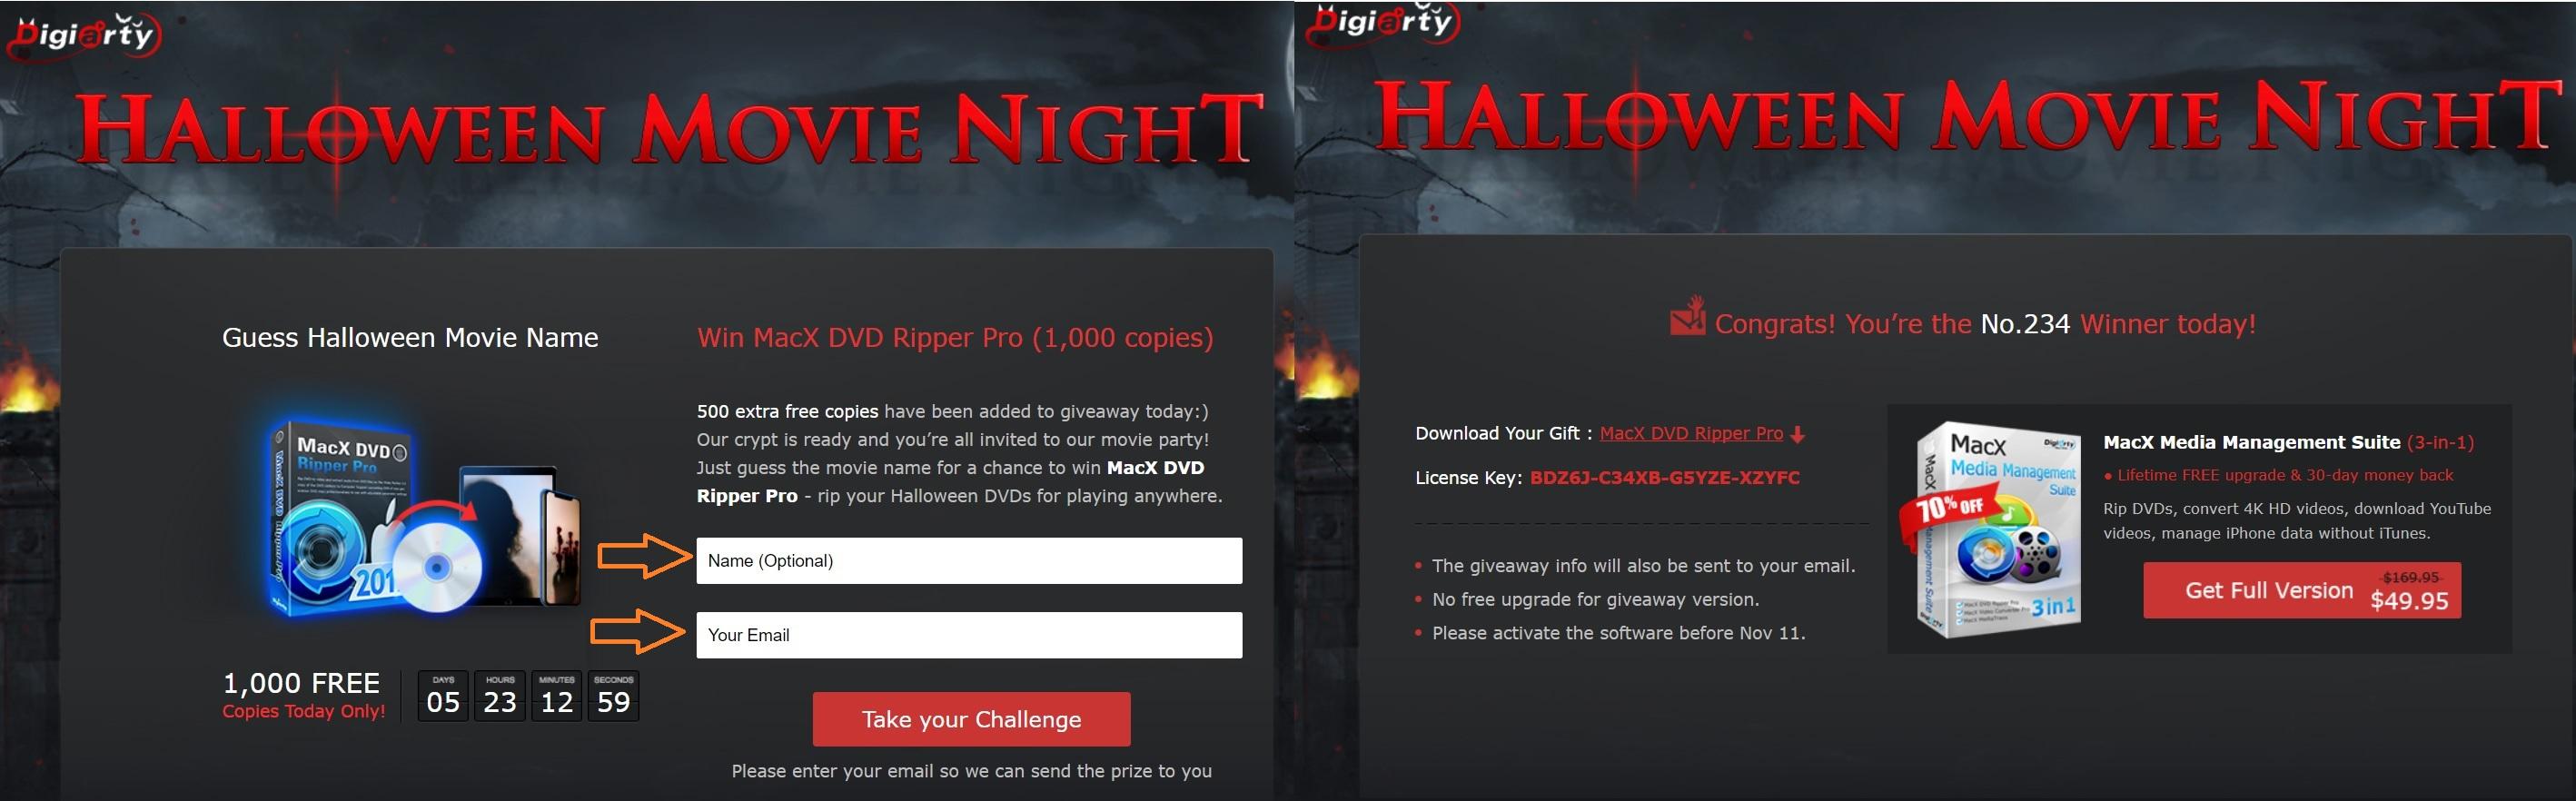 MacX DVD Ripper Pro_giveaway hallowen